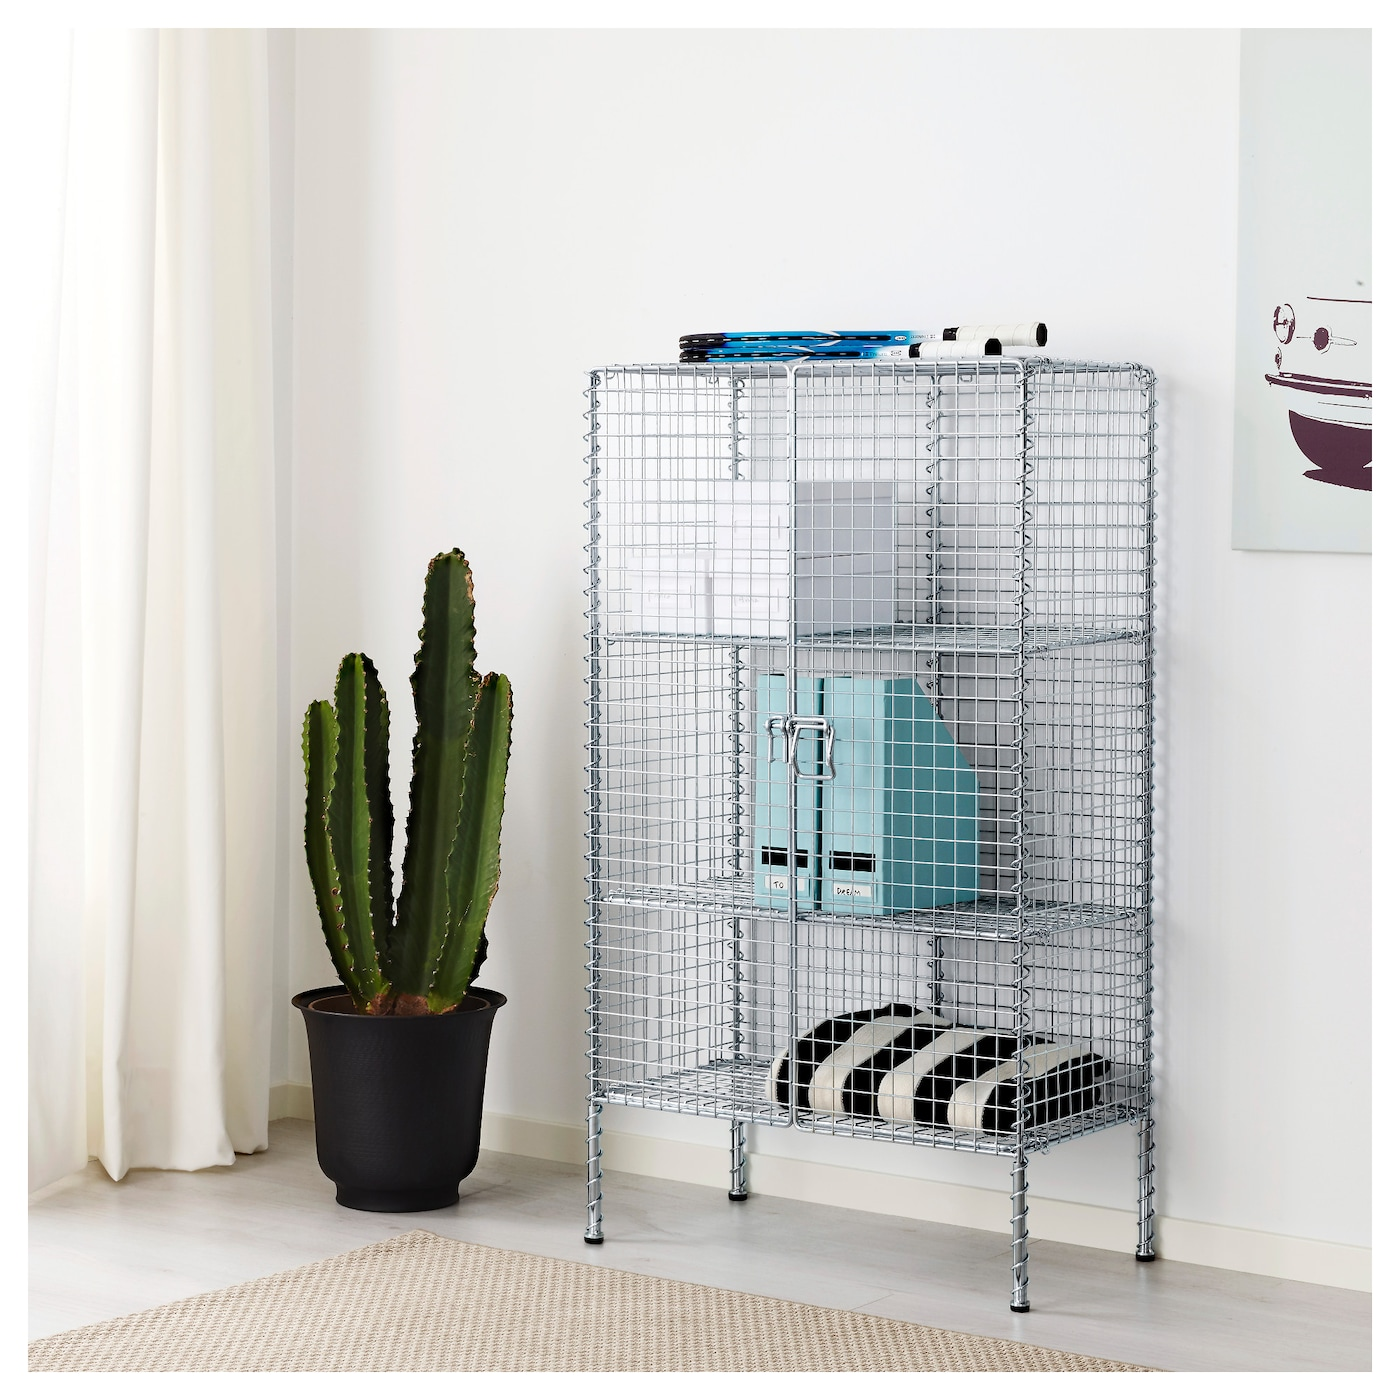 ikea ps 2017 storage unit 69x120 cm ikea. Black Bedroom Furniture Sets. Home Design Ideas